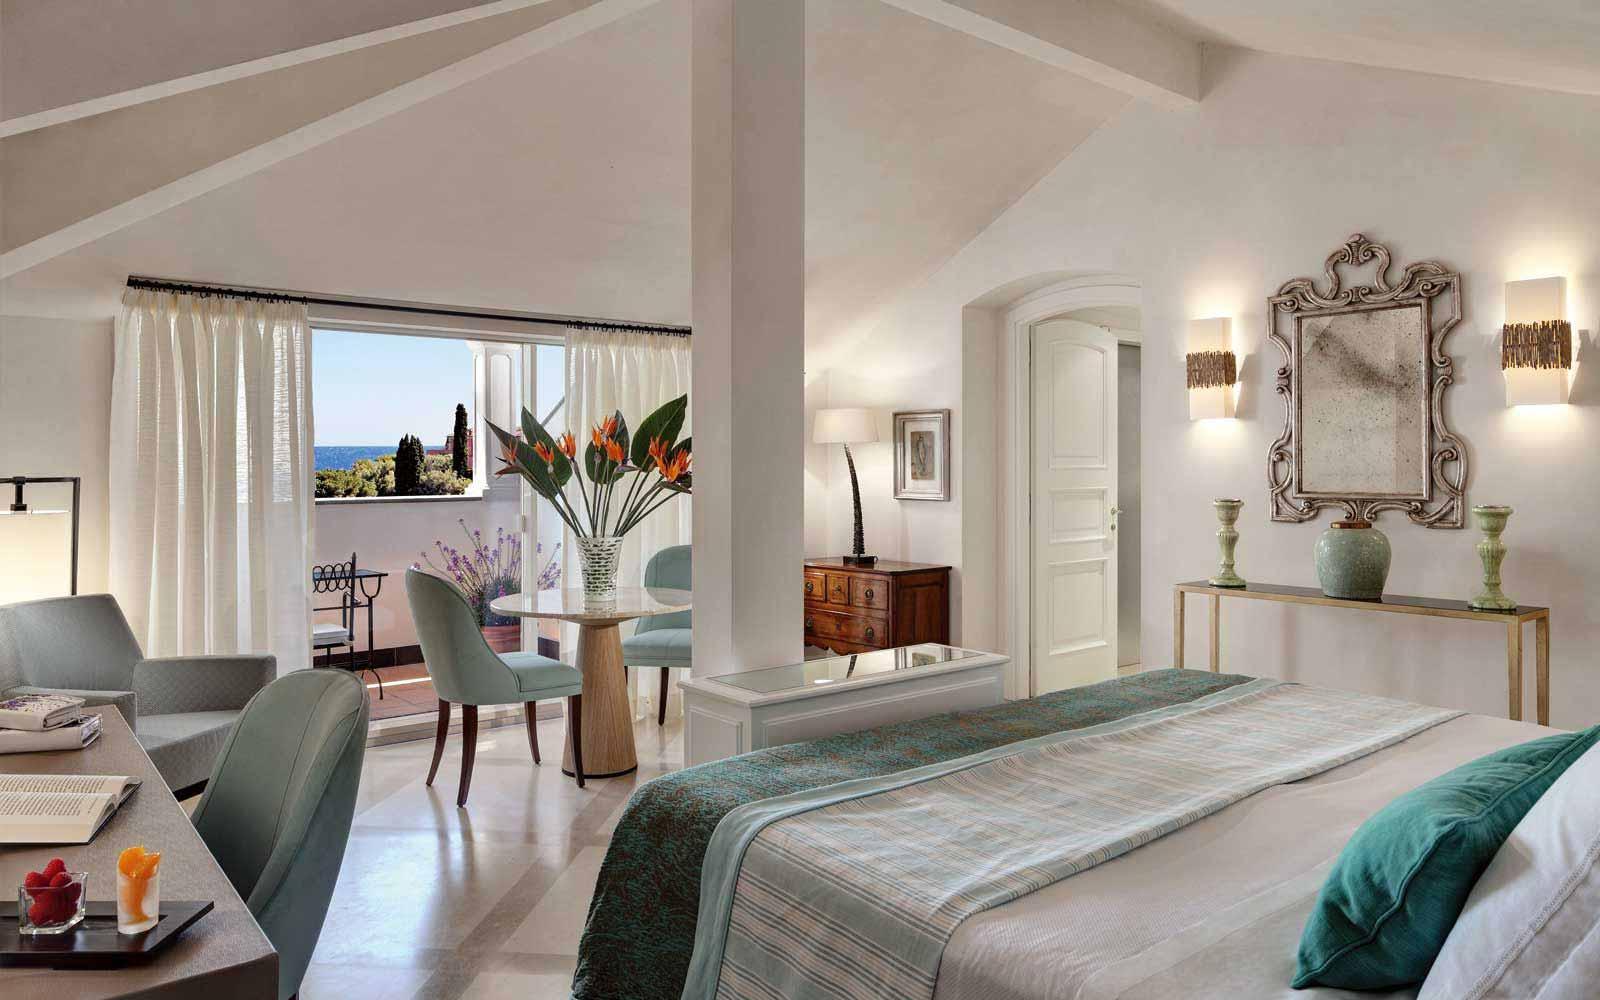 Exclusive Suite at Belmond Hotel Splendido & Splendido Mare